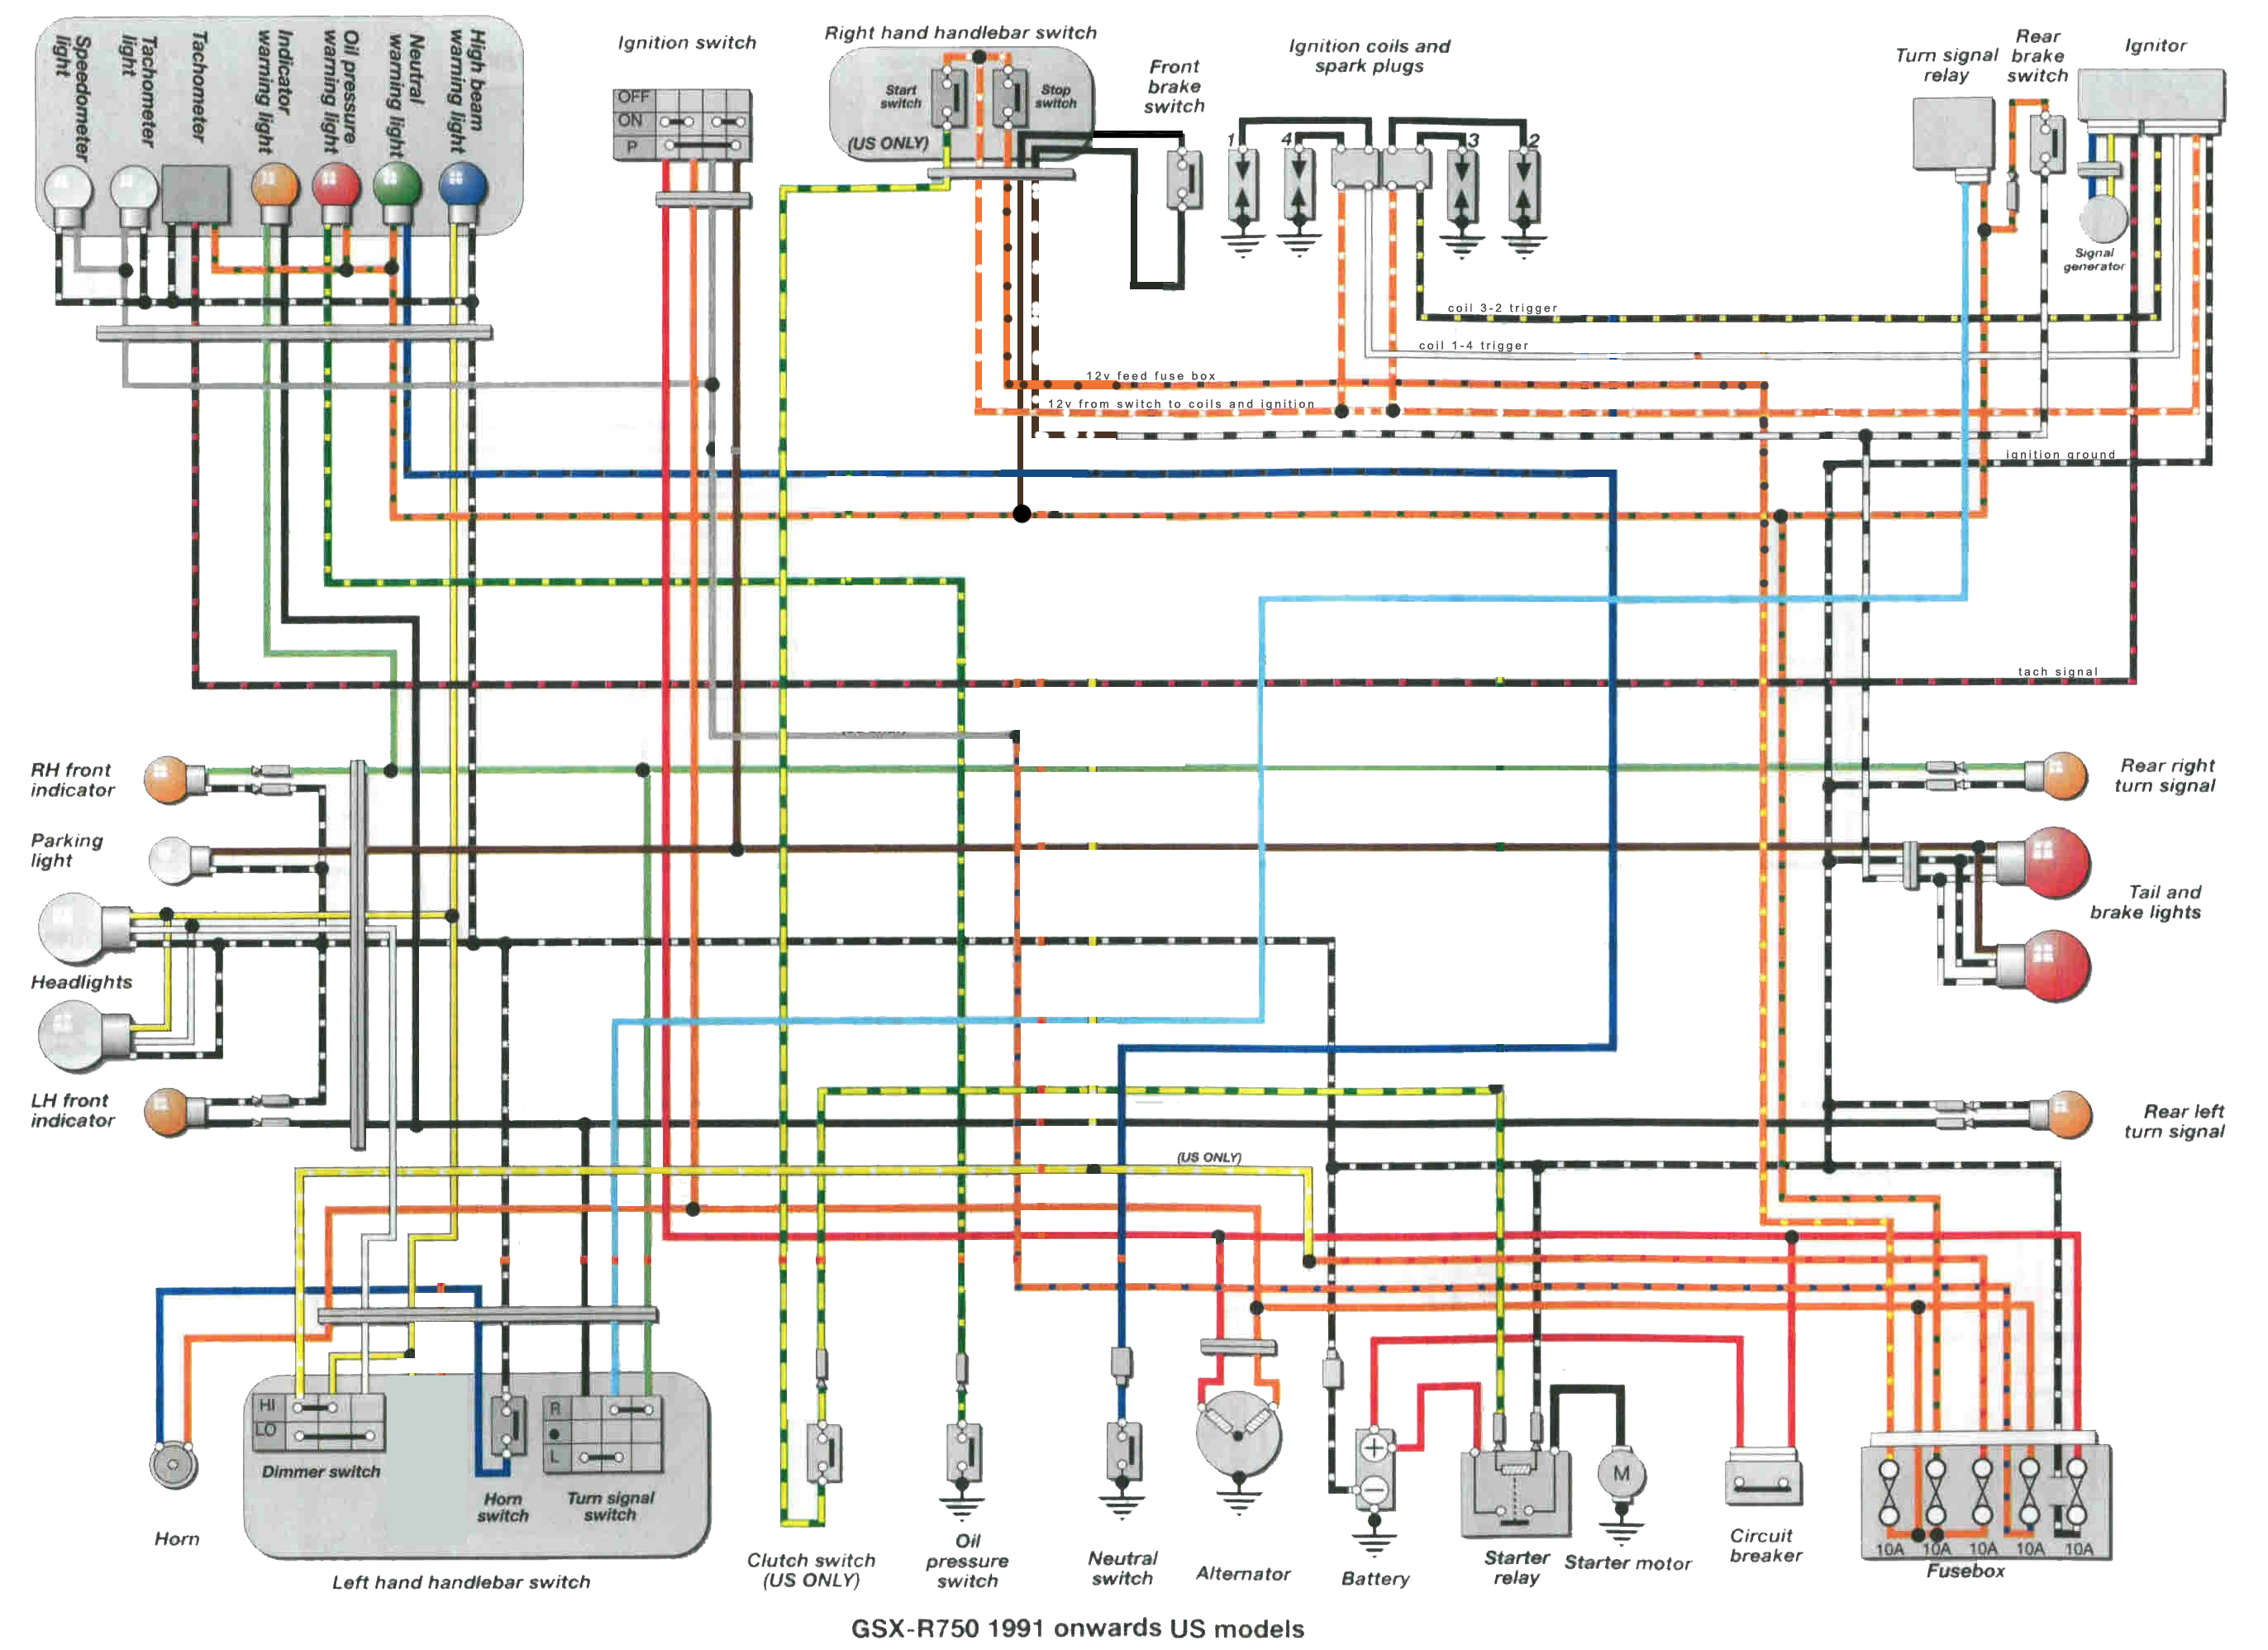 [DIAGRAM_5NL]  YT_1836] Suzuki Gsxr 1000 Wiring Diagram Download Diagram | 2002 Suzuki Gsxr 750 Wire Schematic |  | Unre Erbug Tzici Inama Mohammedshrine Librar Wiring 101